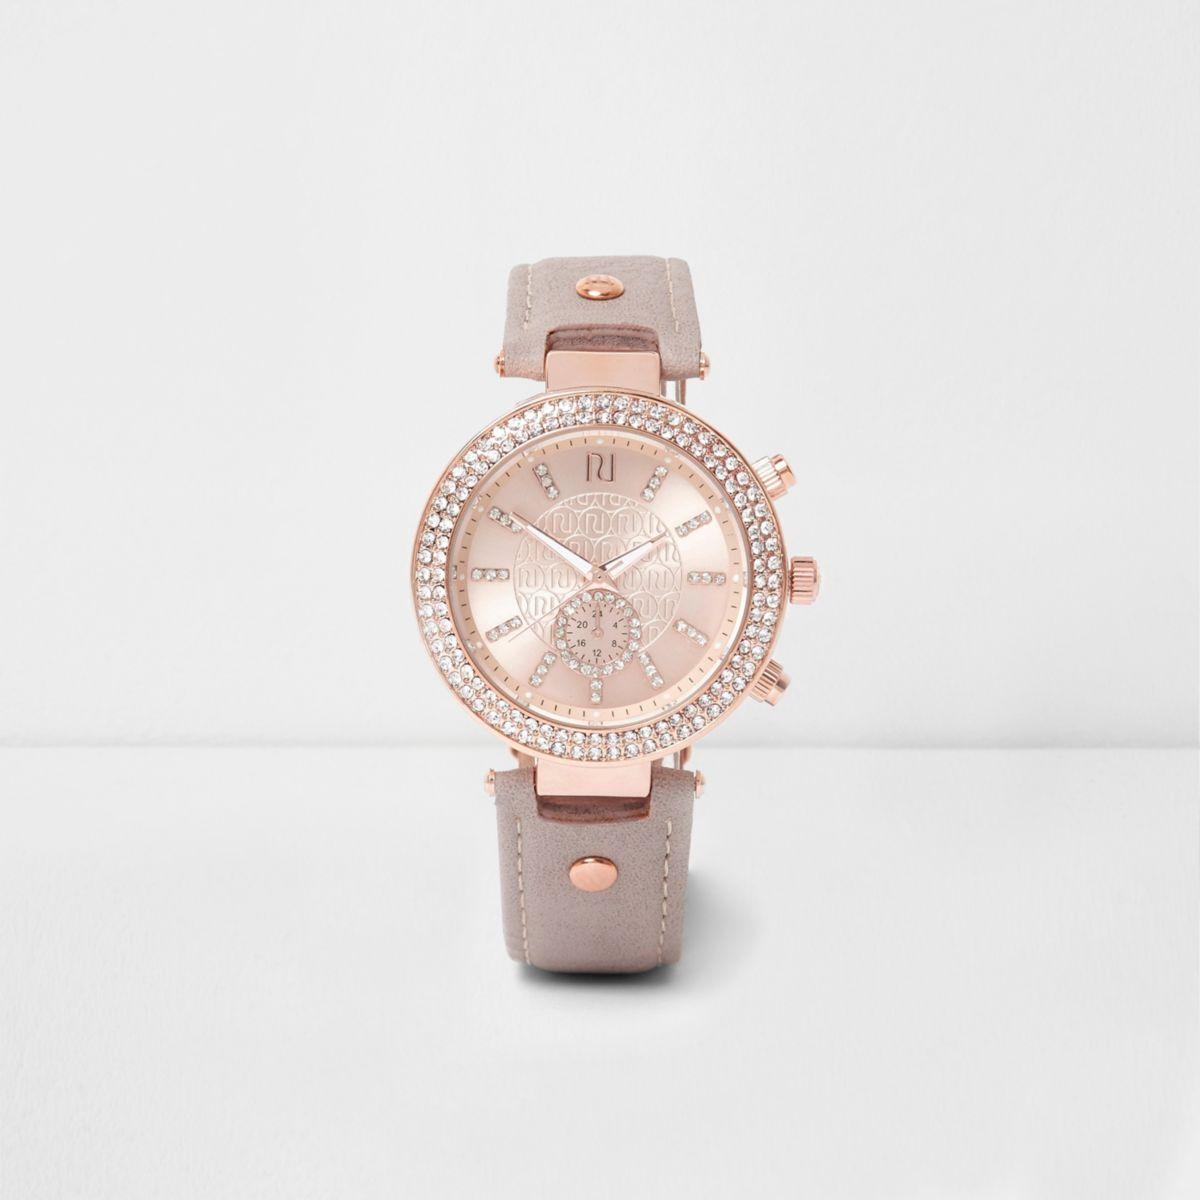 Plus grey and rose gold tone rhinestone watch